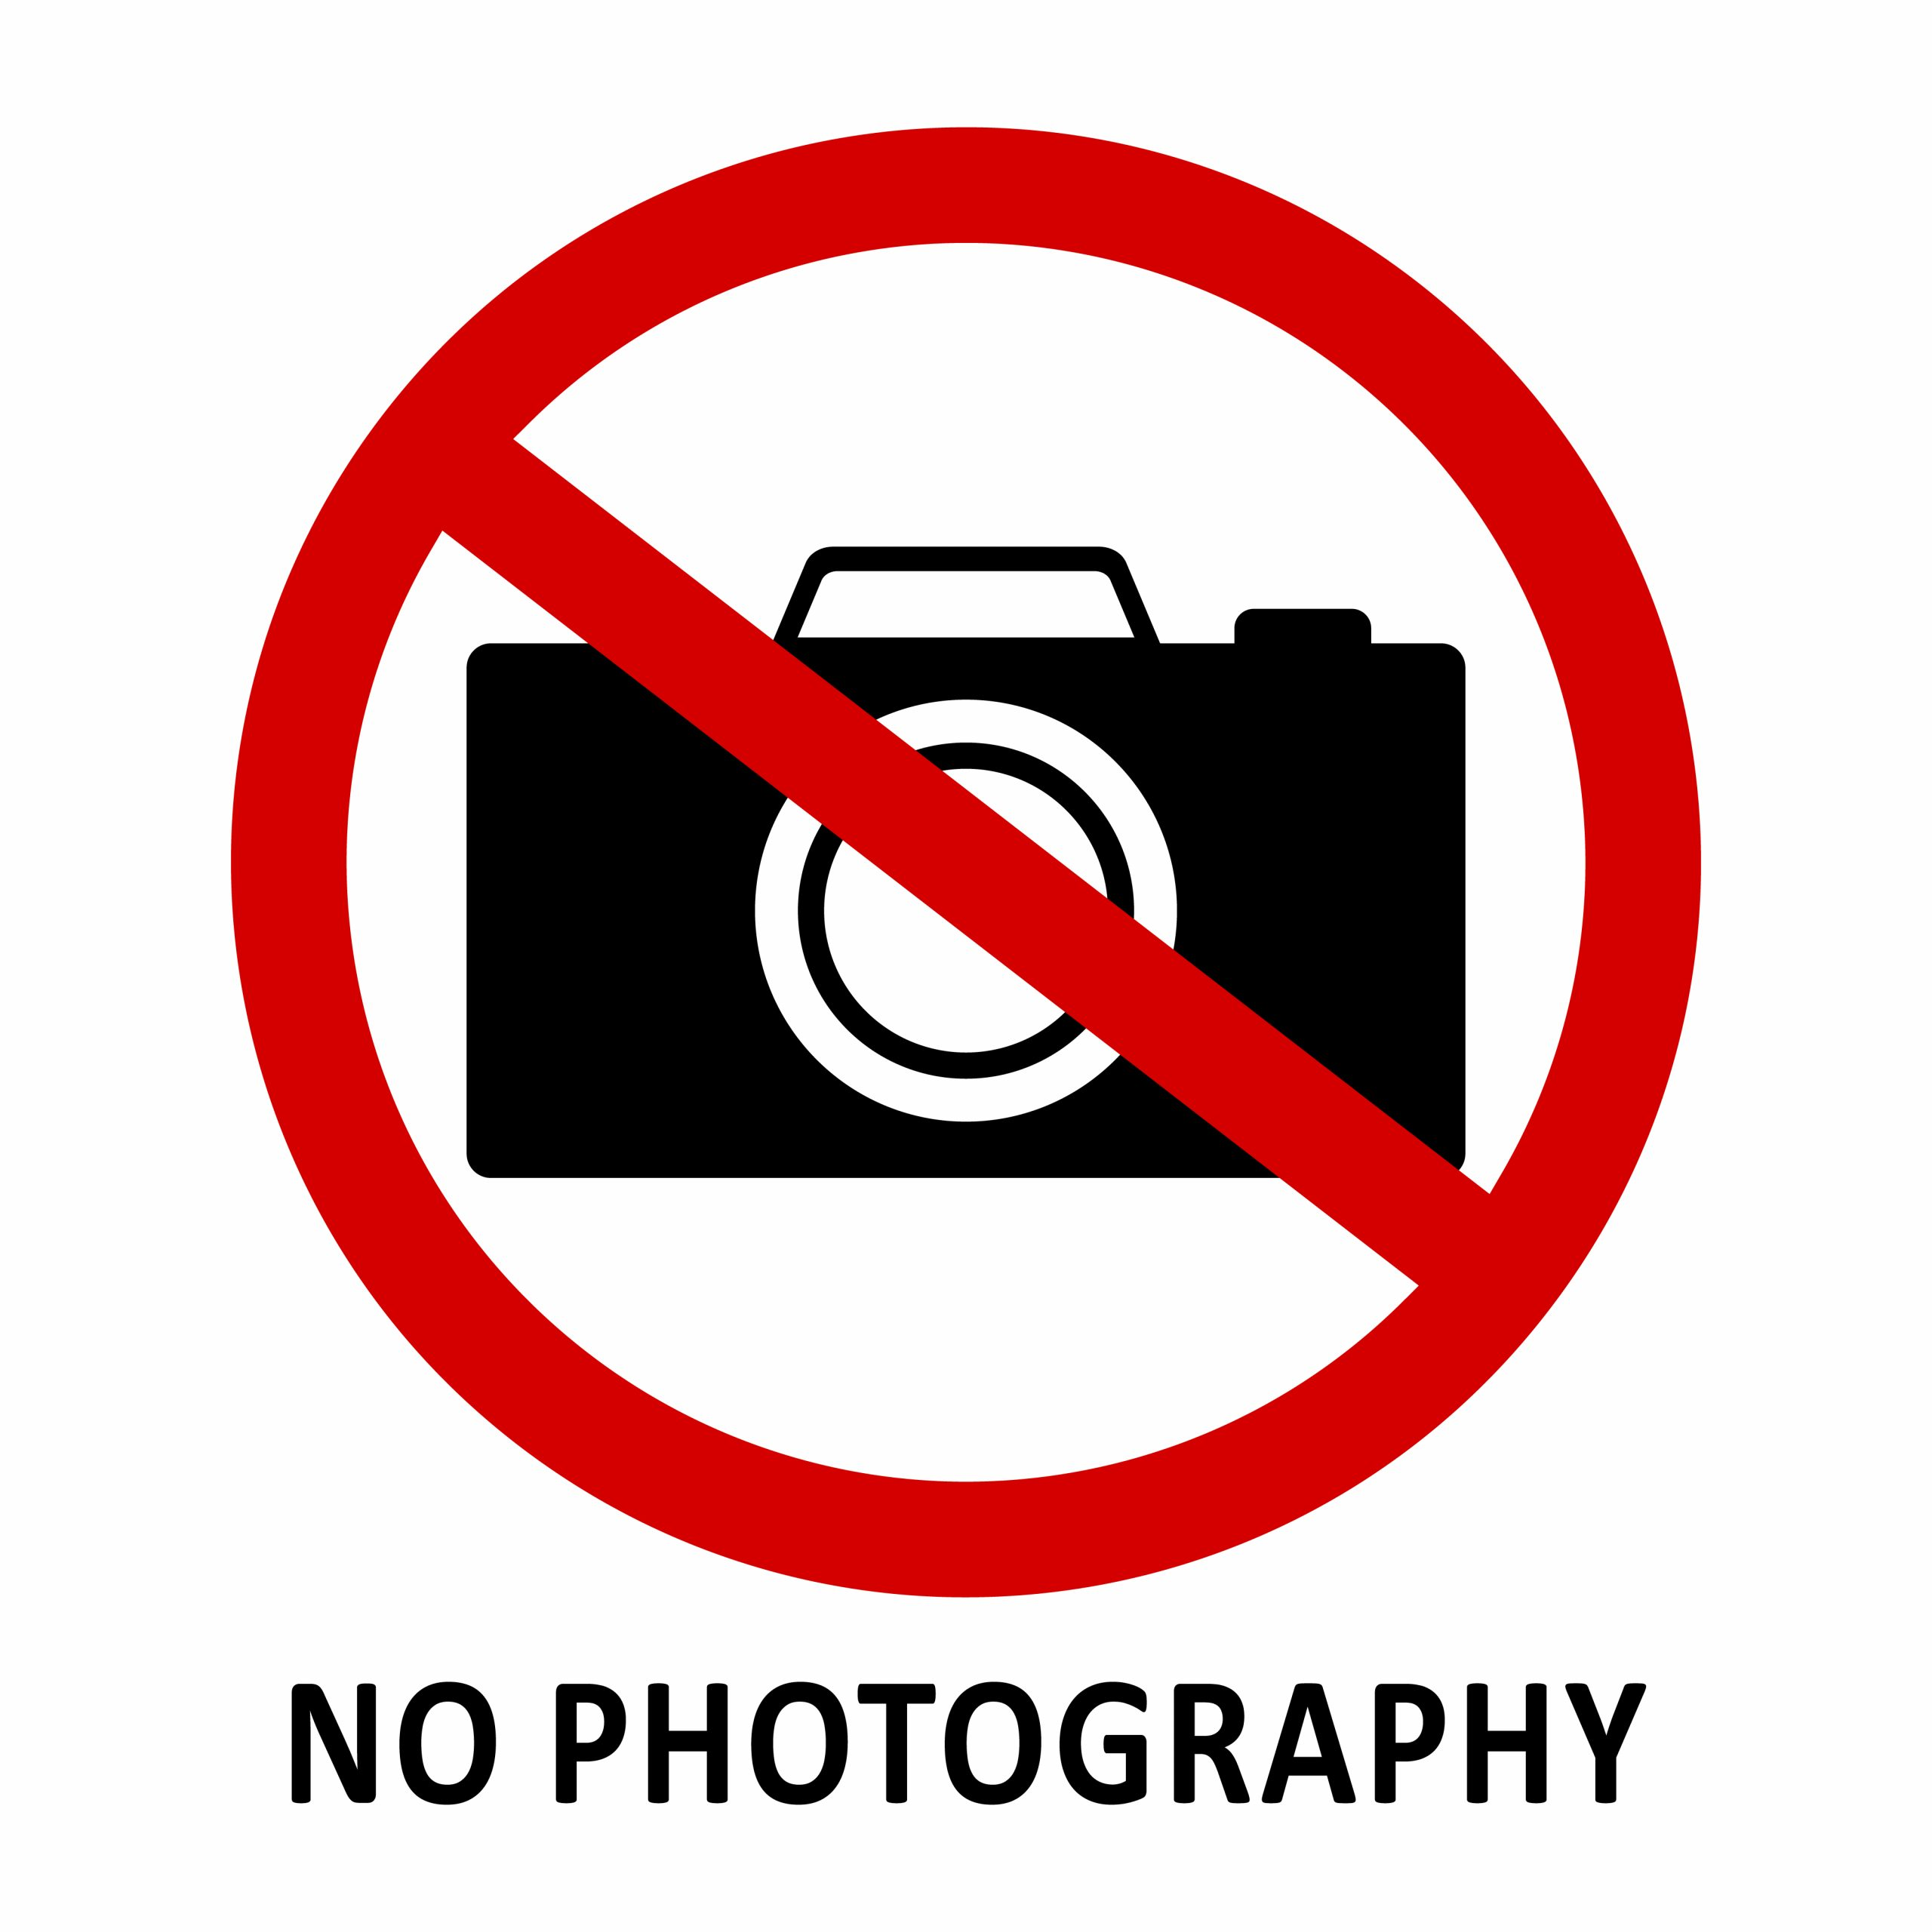 Quilt shops no photography rule